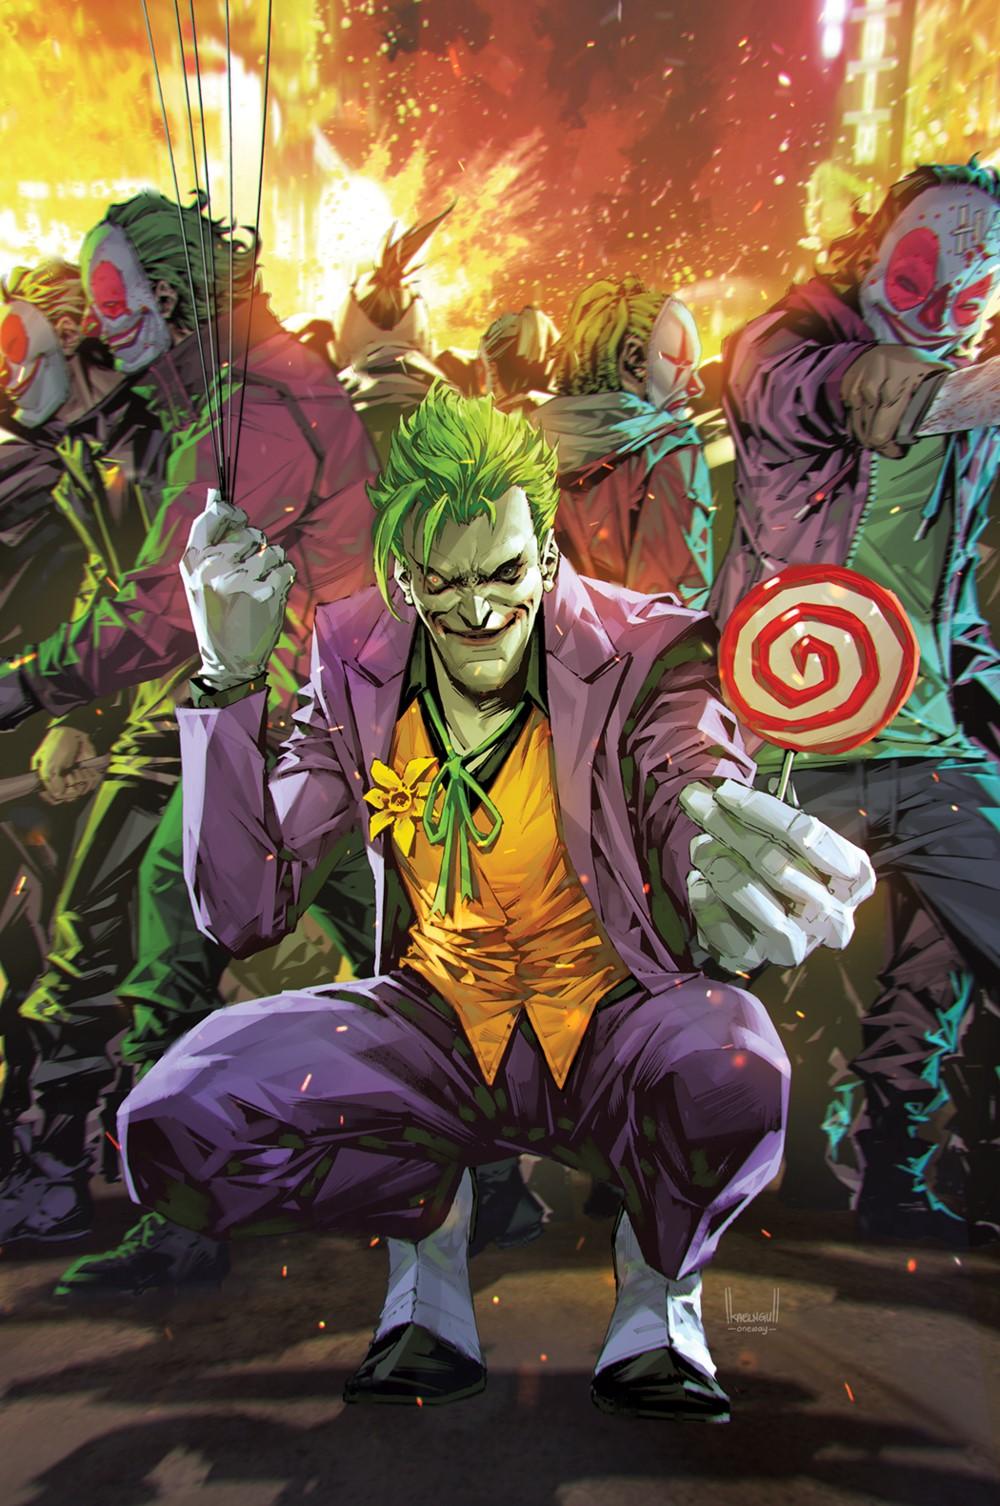 Joker_Cv11-Variant2 DC Comics December 2021 Solicitations